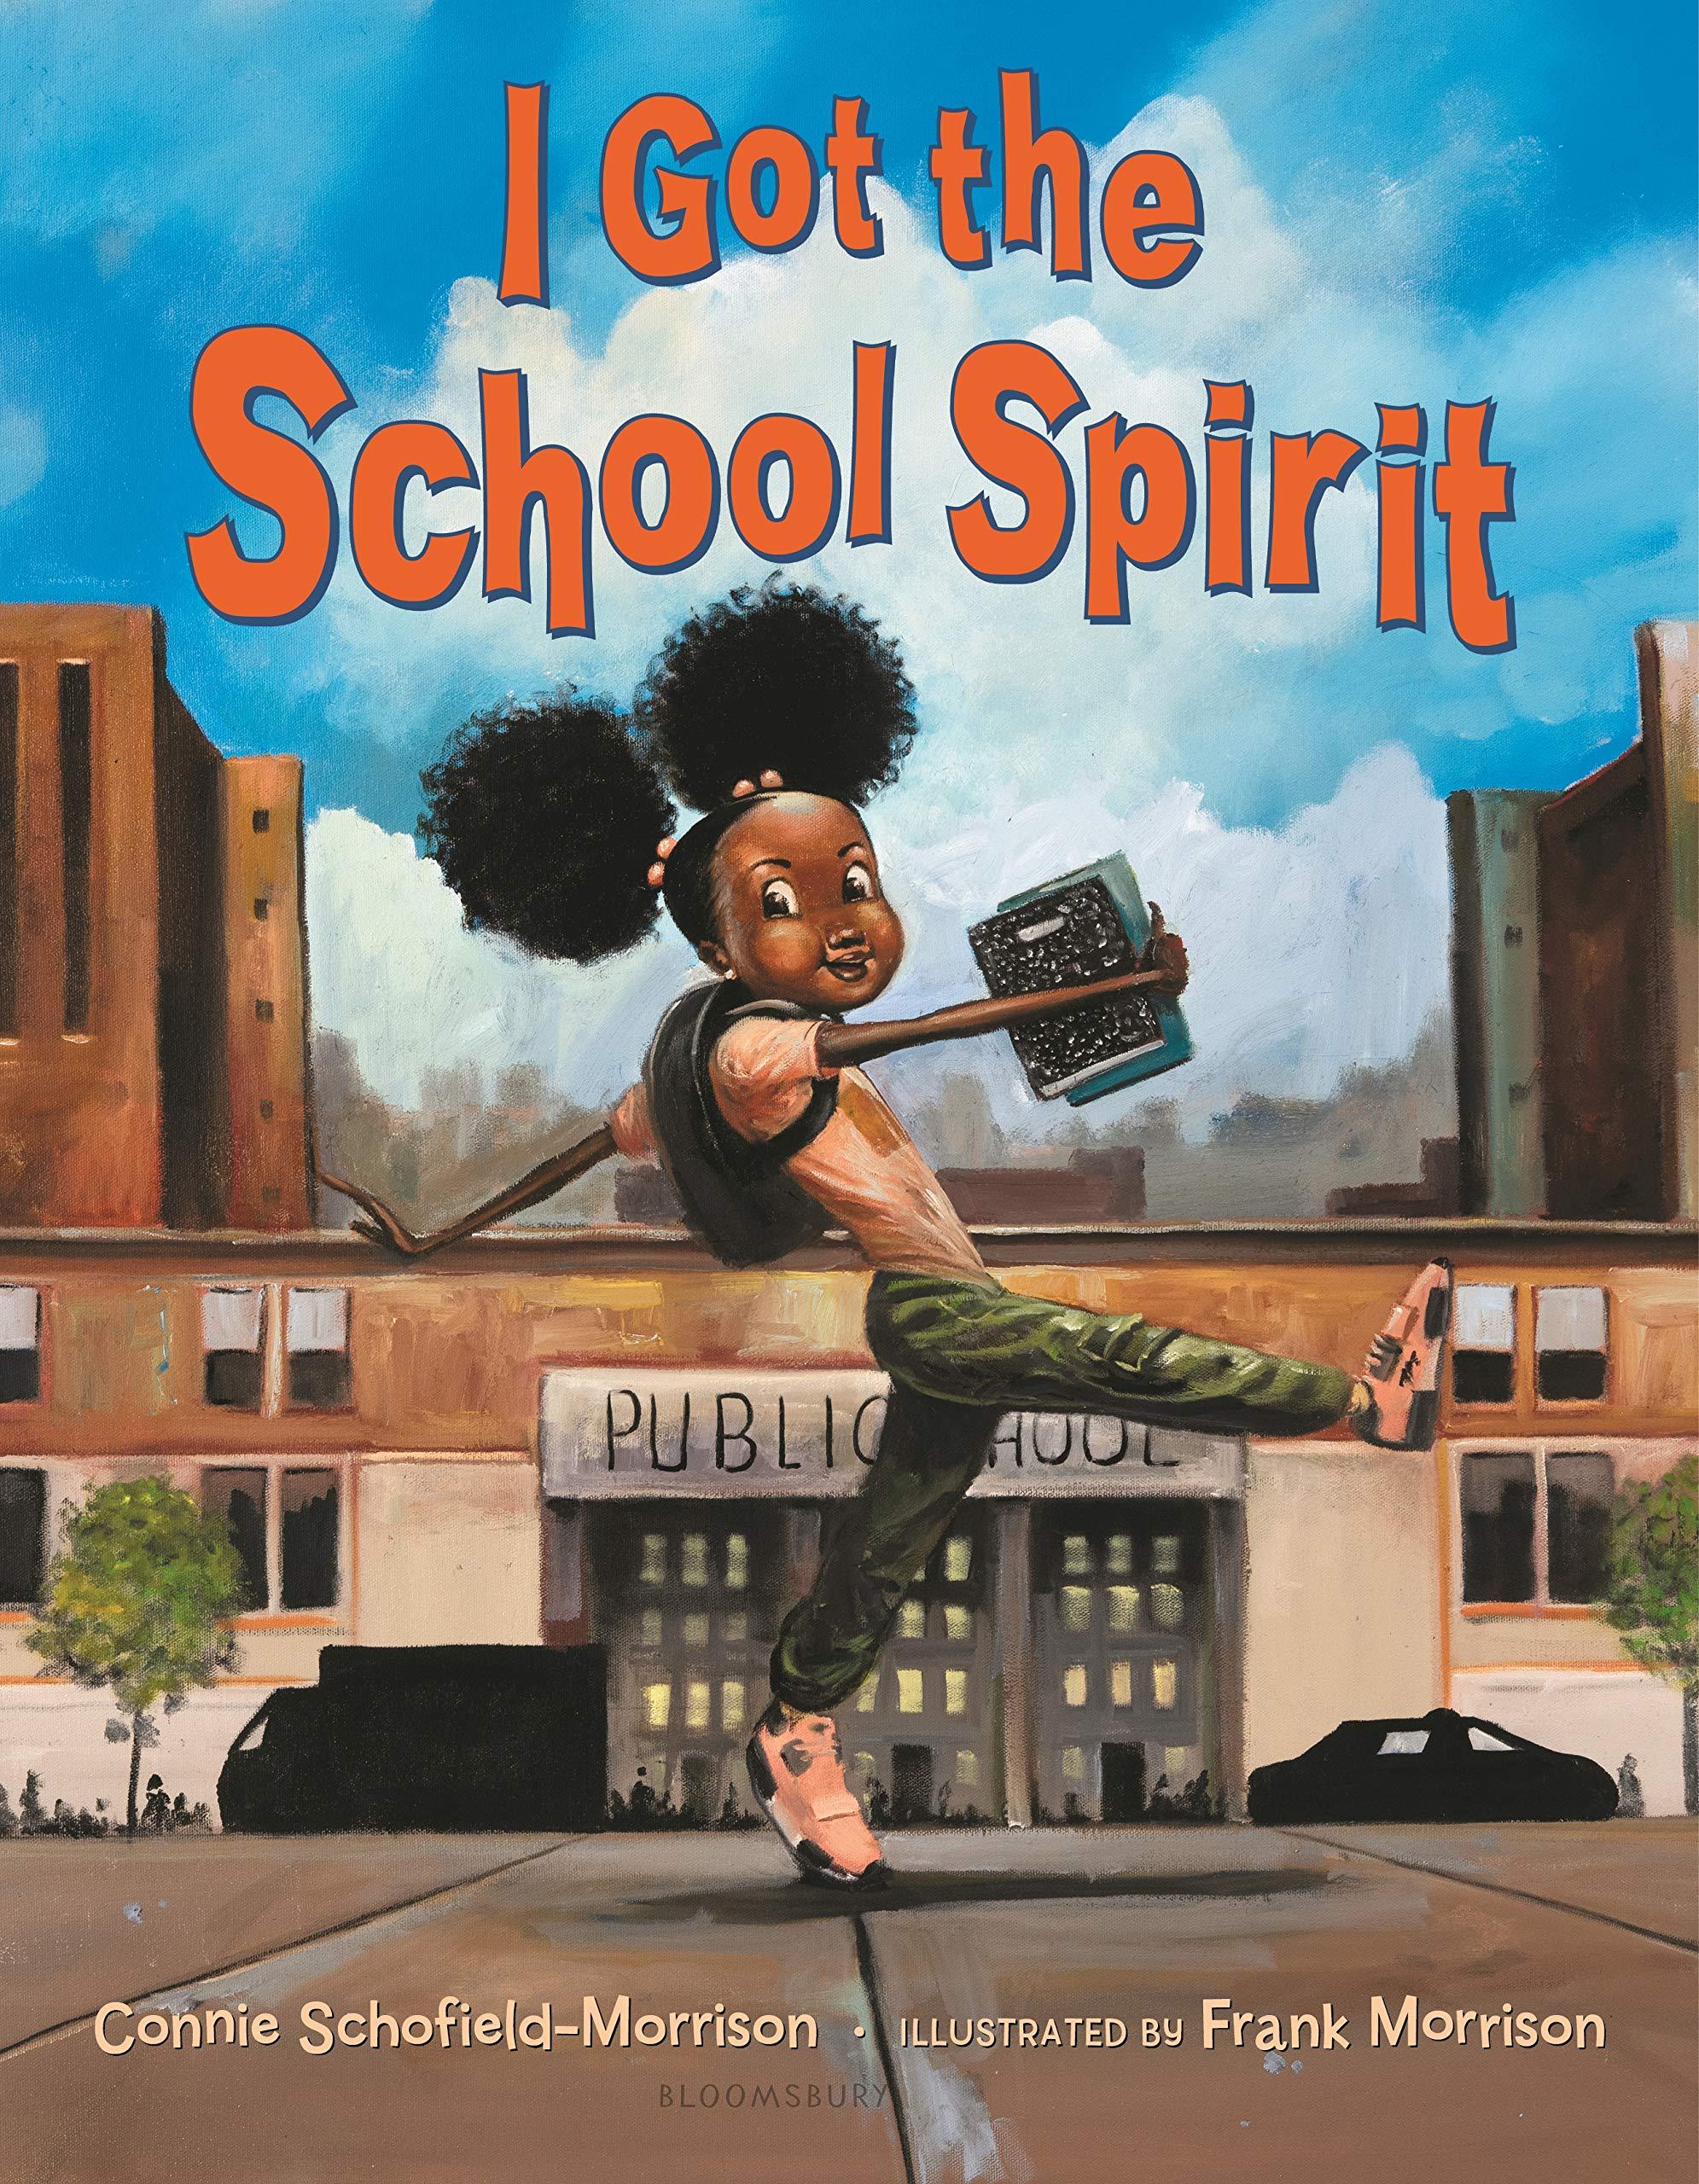 I Got the School Spirit: Schofield-Morrison, Connie, Morrison, Frank:  9781547602612: Amazon.com: Books